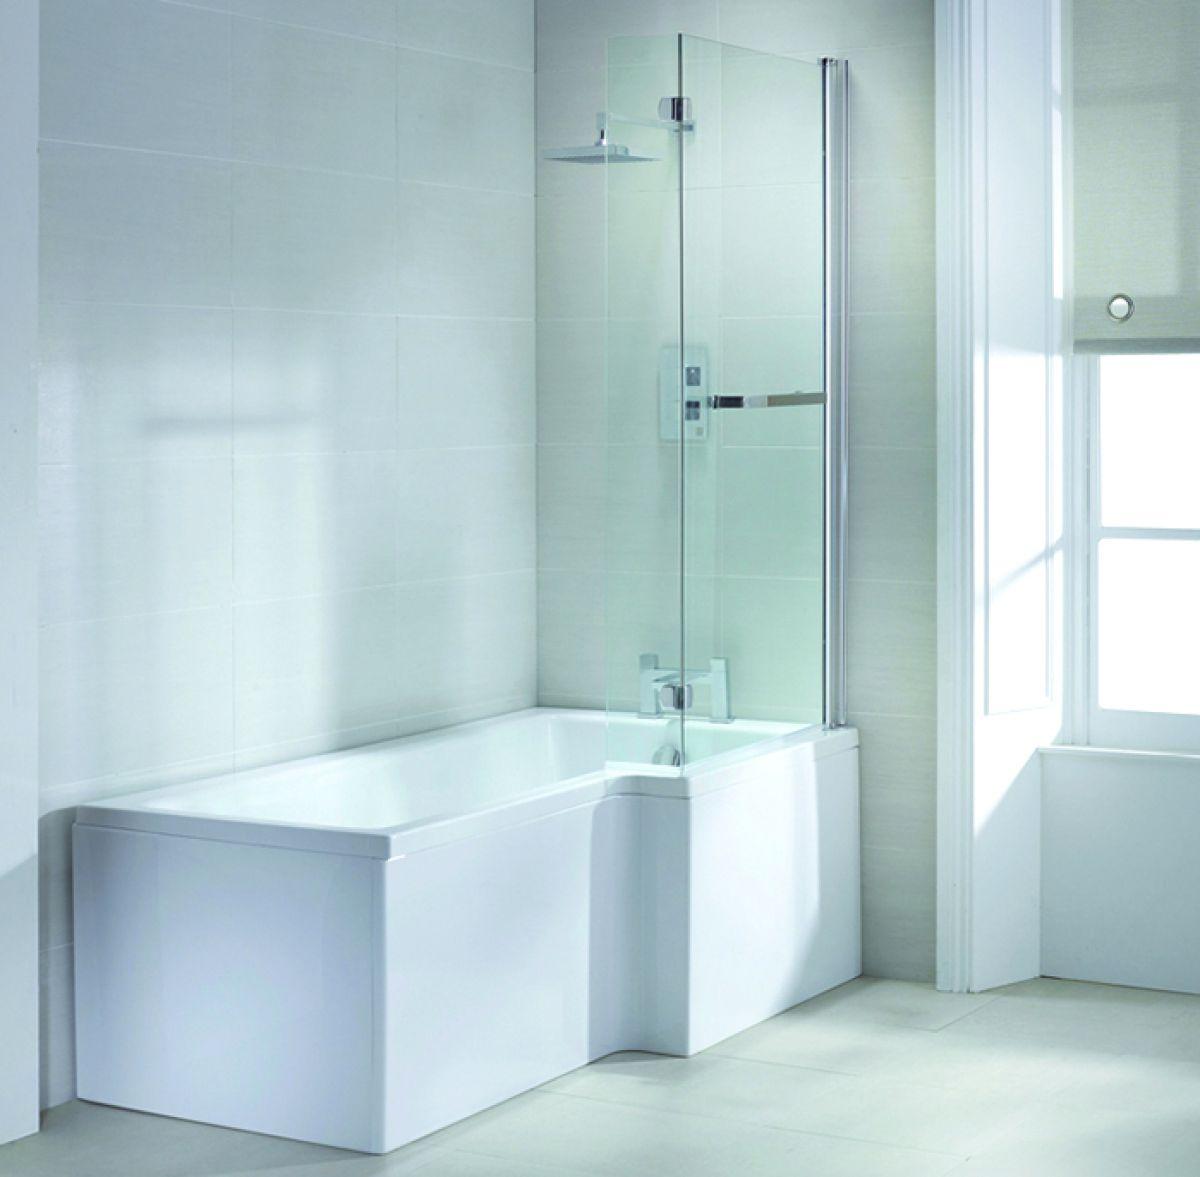 L shaped bath sommer l shaped shower bath package JFBNJEX